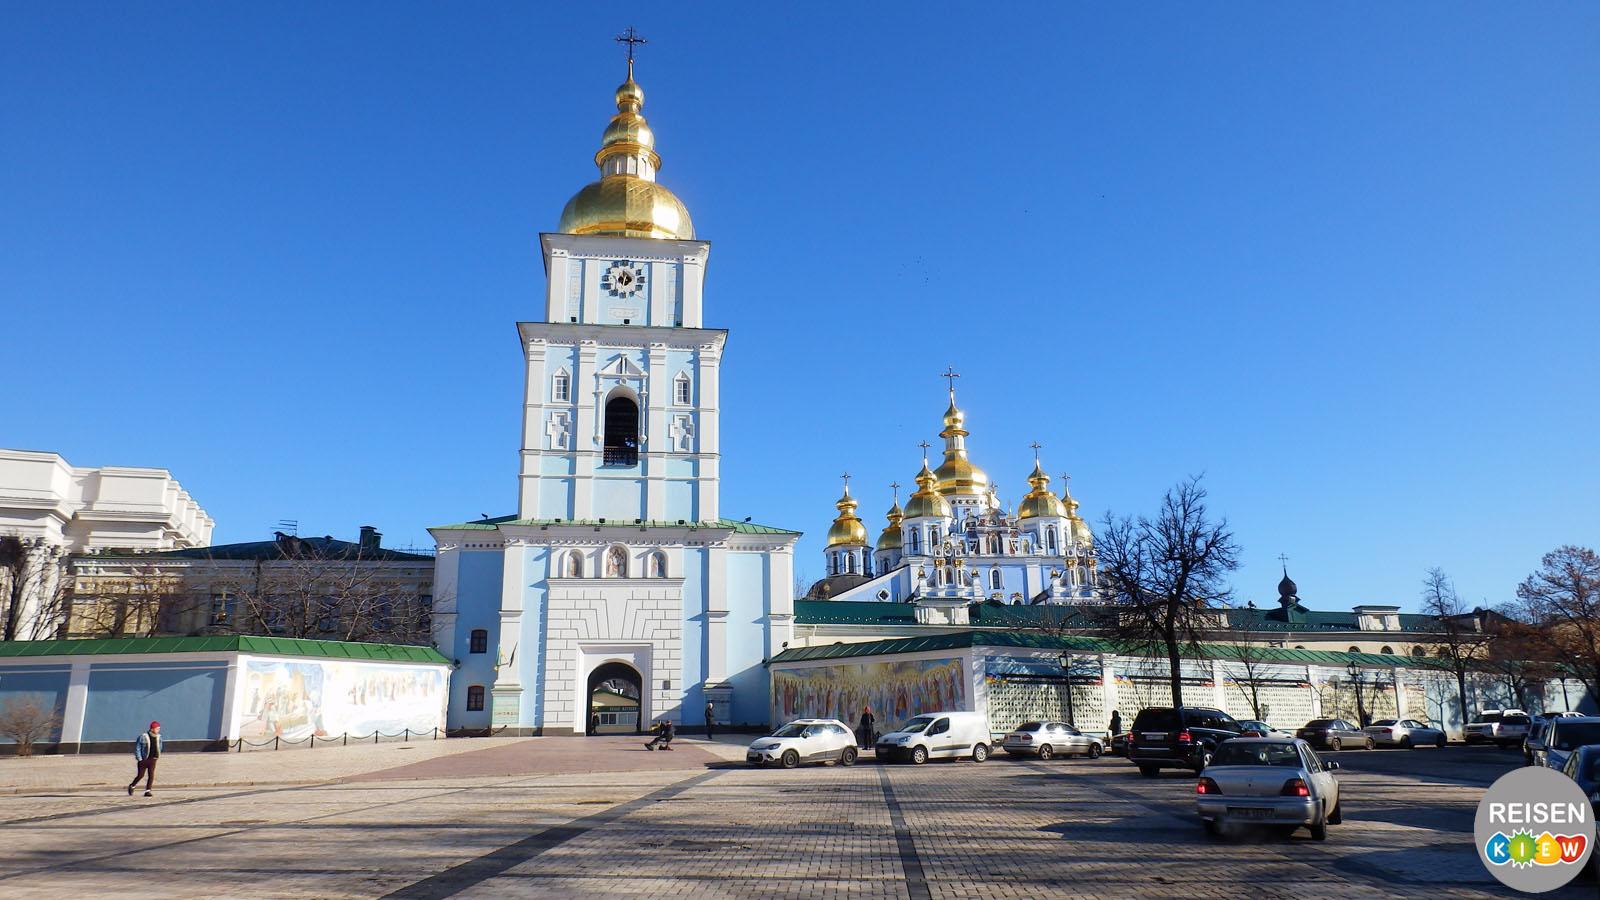 Michaelplatz in Kiew